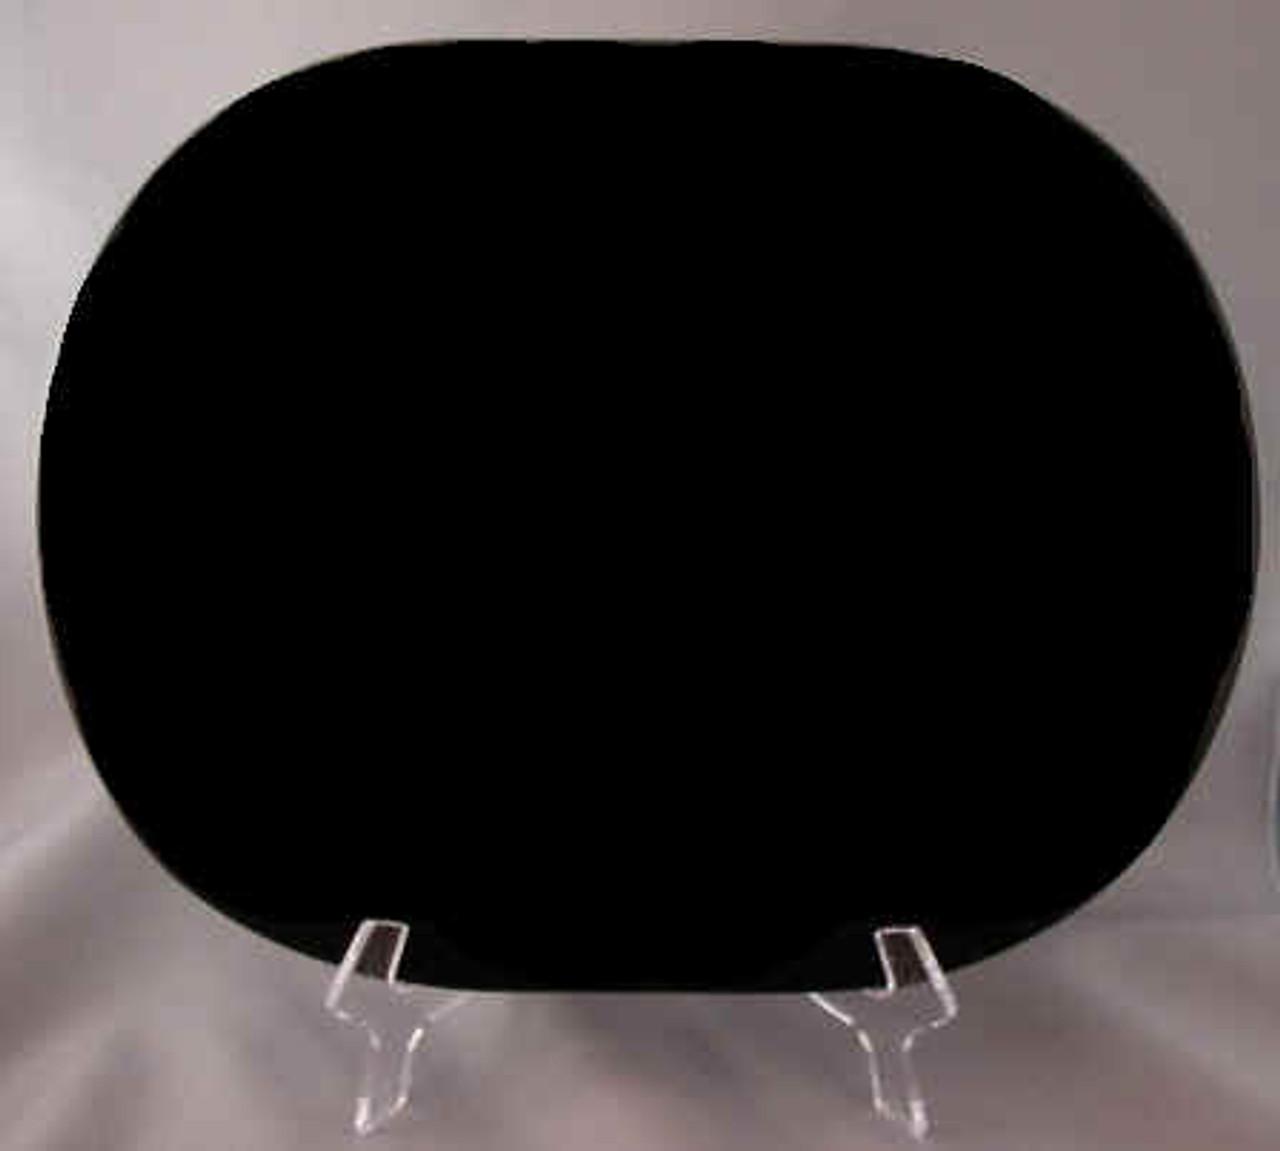 "G-SB-8.5x11OvalEP:  Laser Grade, Super Black Granite, 8.5"" x 11"" x 10mm Oval, (5 face polished)."